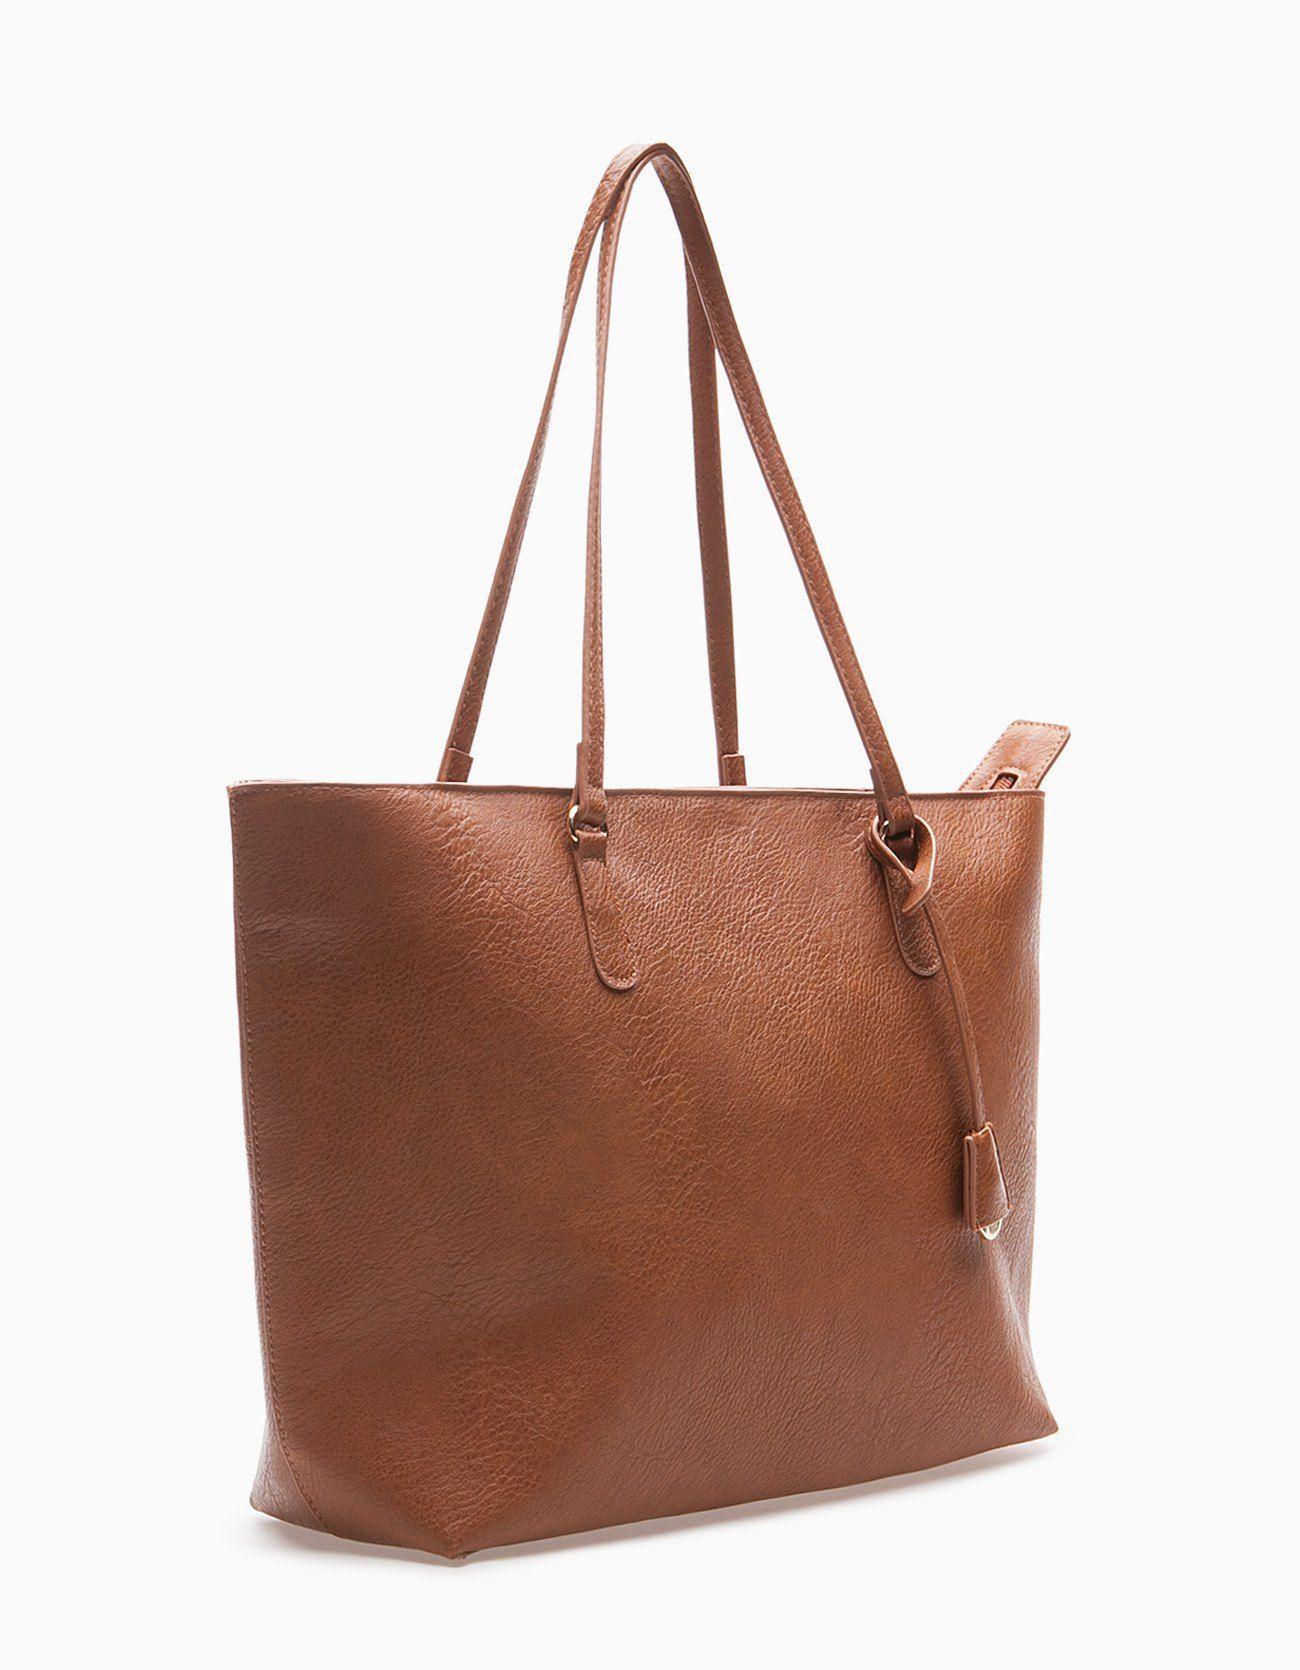 7526082d6 Bolso shopper - BOLSOS - MUJER | Stradivarius Panamá | Bags en 2019 ...